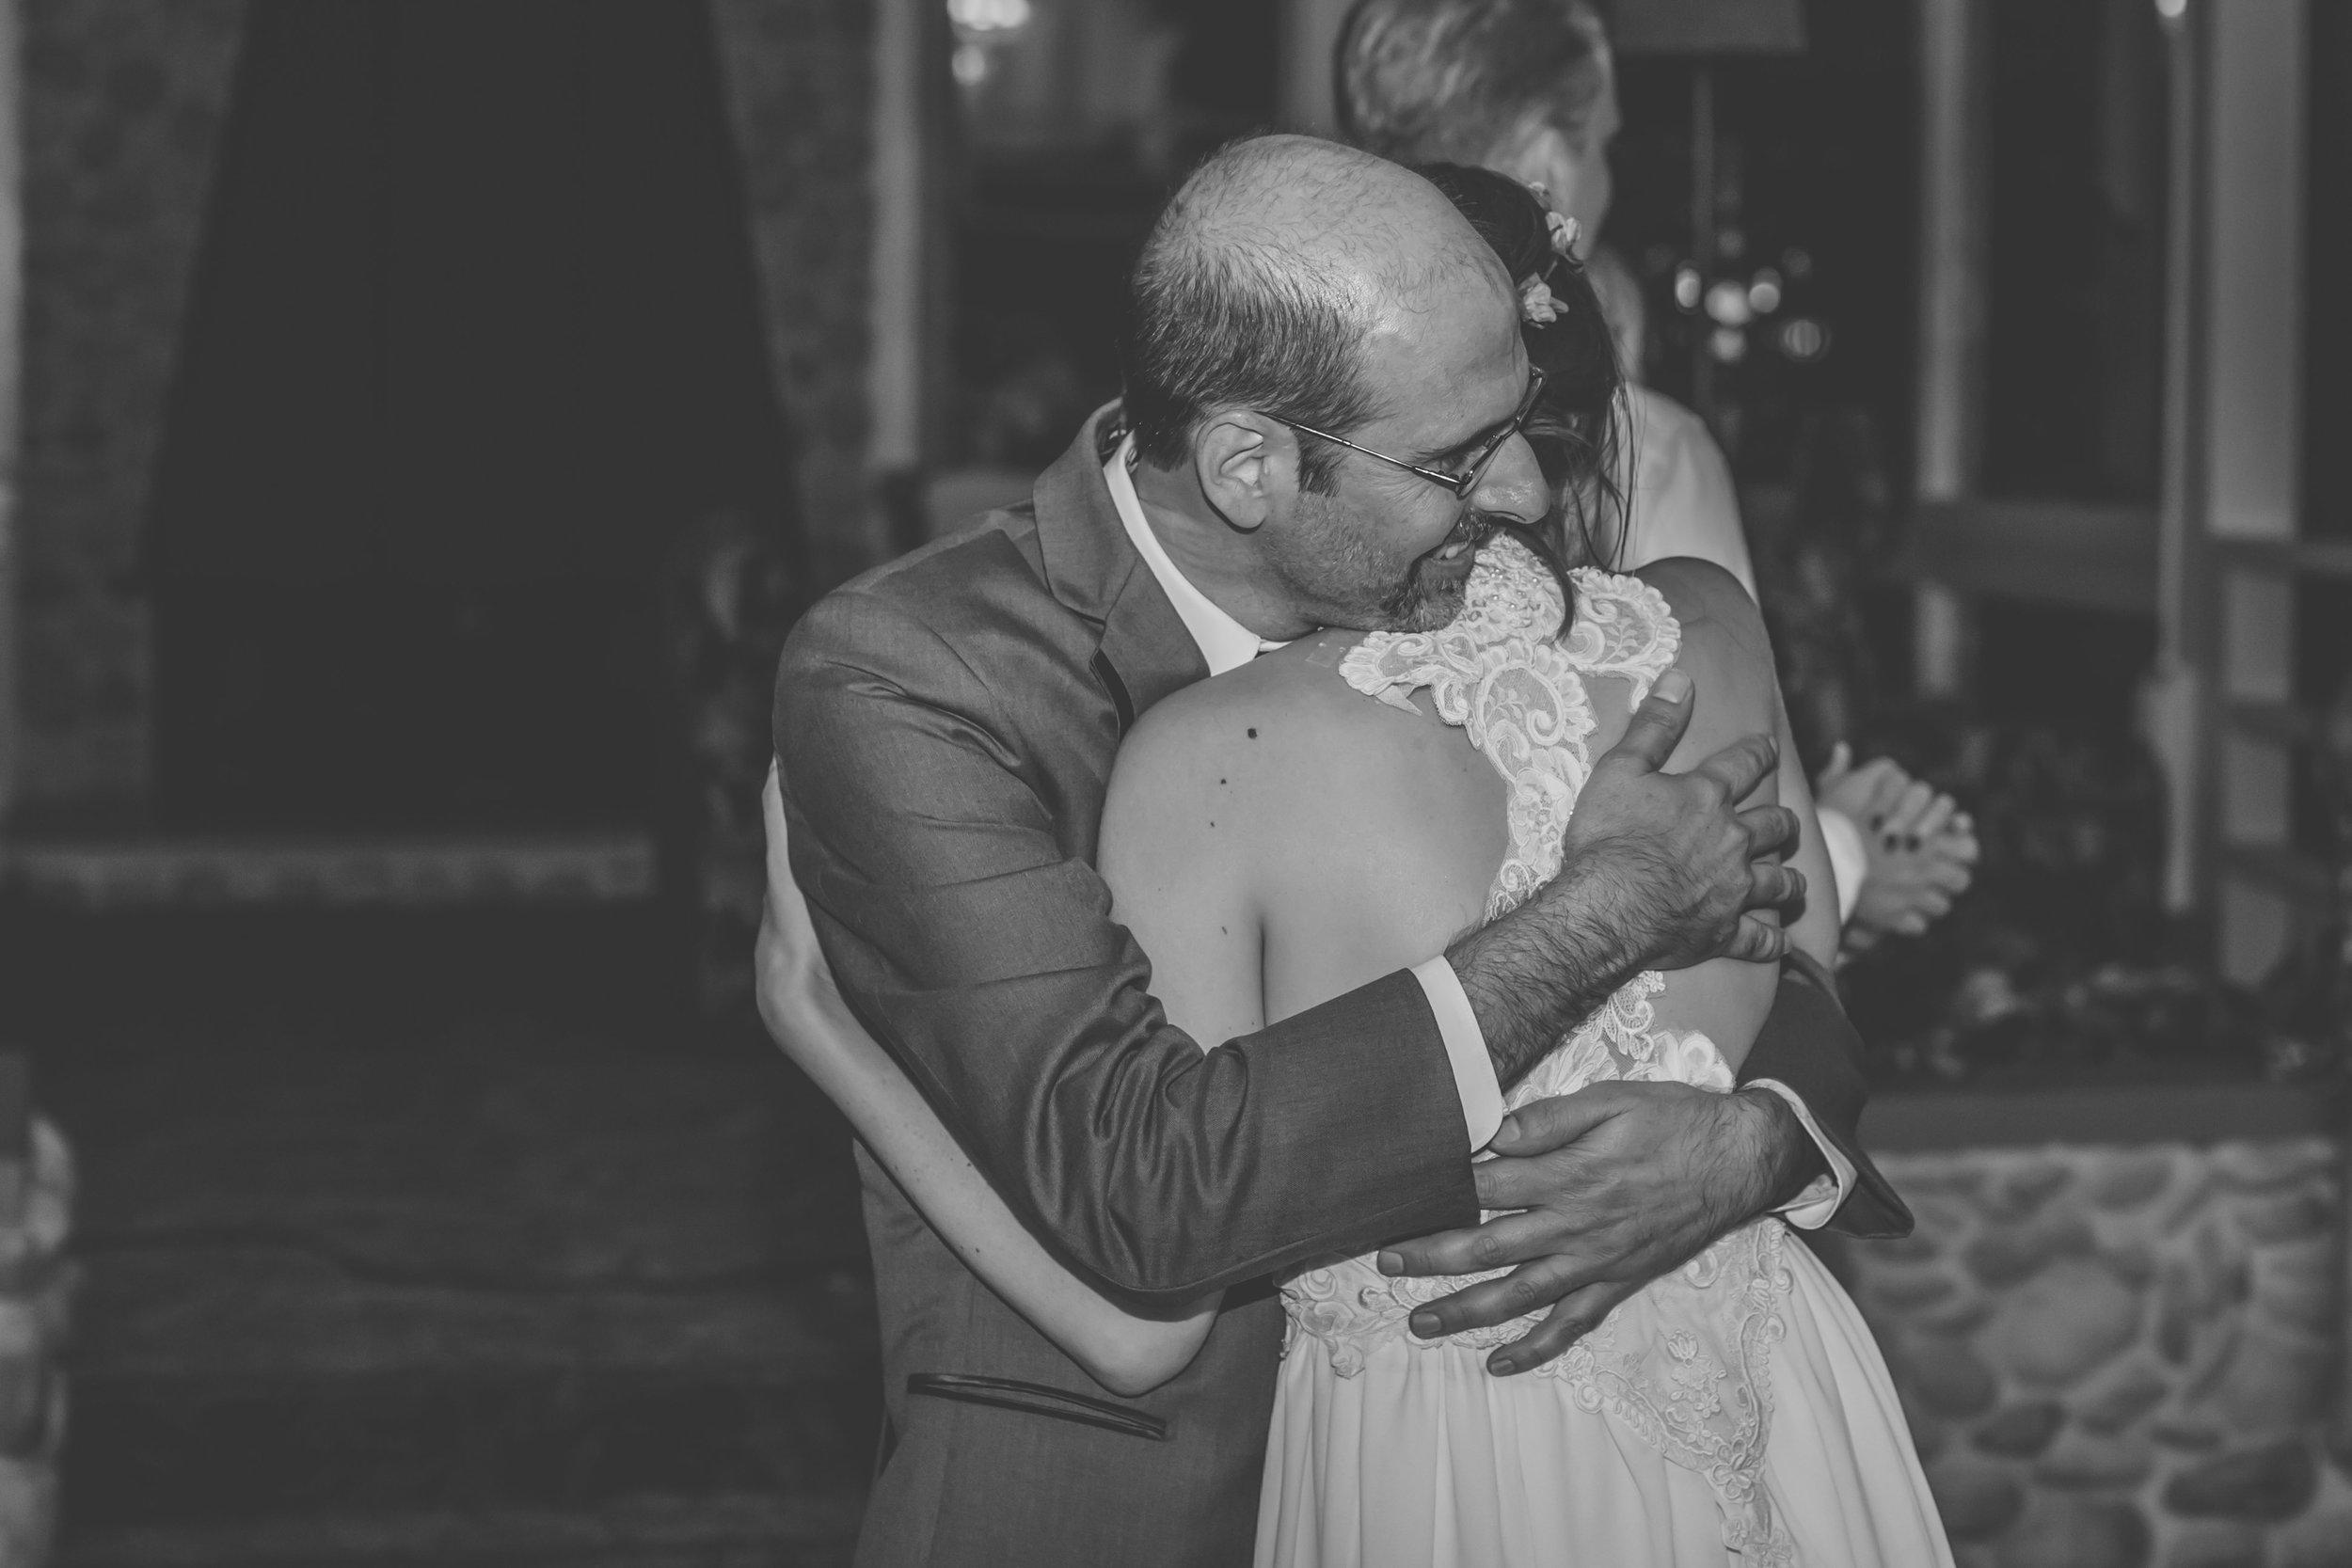 20141024-DePartee-Wedding-APavone-057-sm.jpg